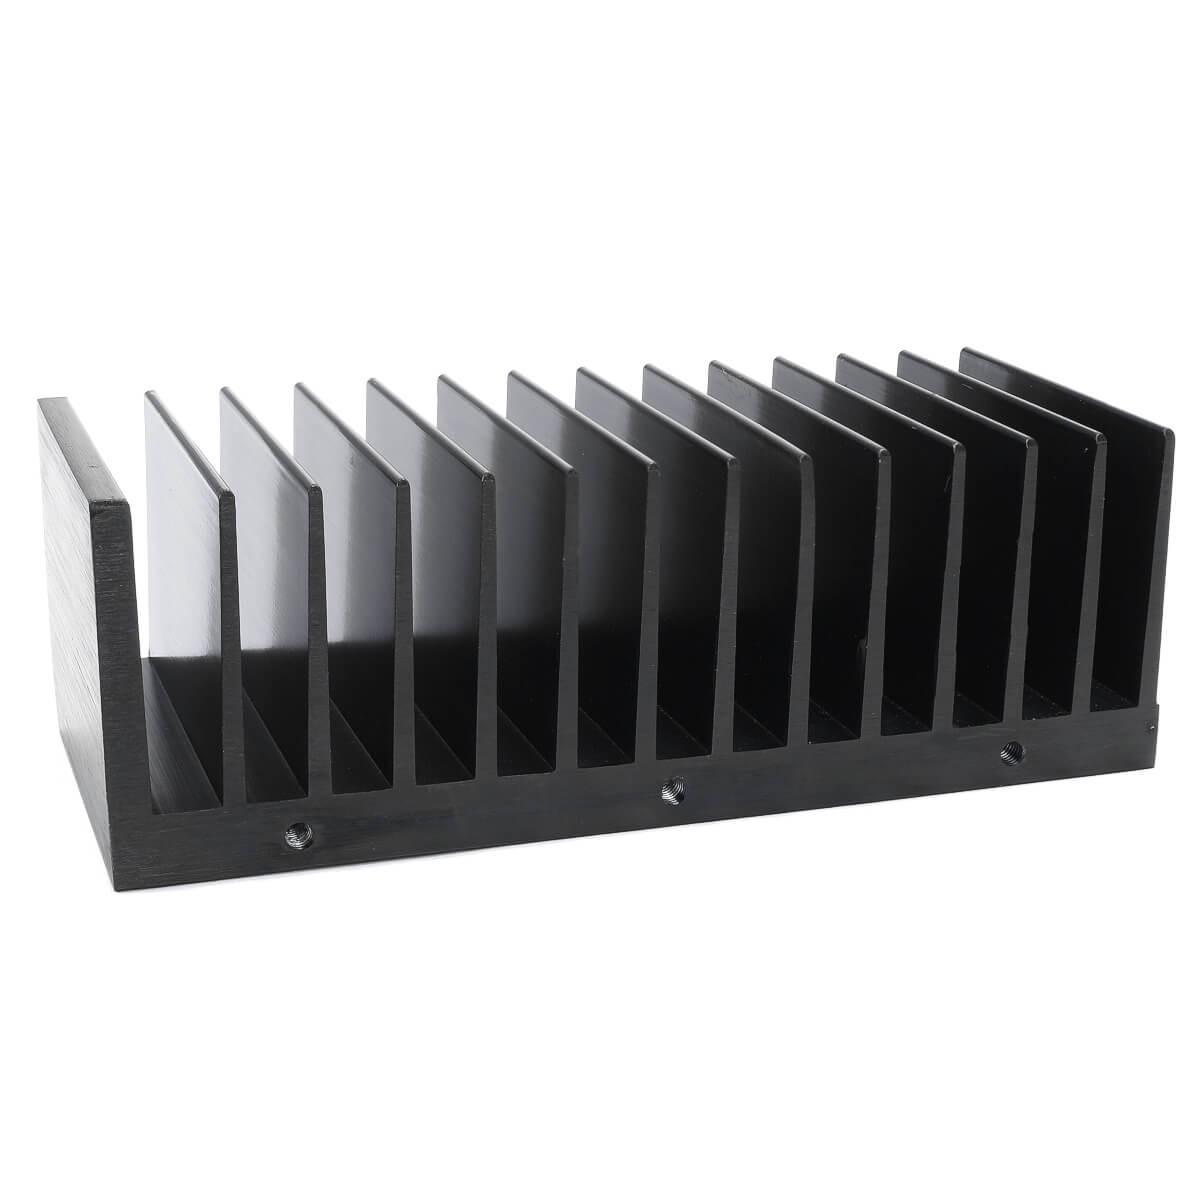 Heatsink Radiator Black Anodized 145x50x60mm